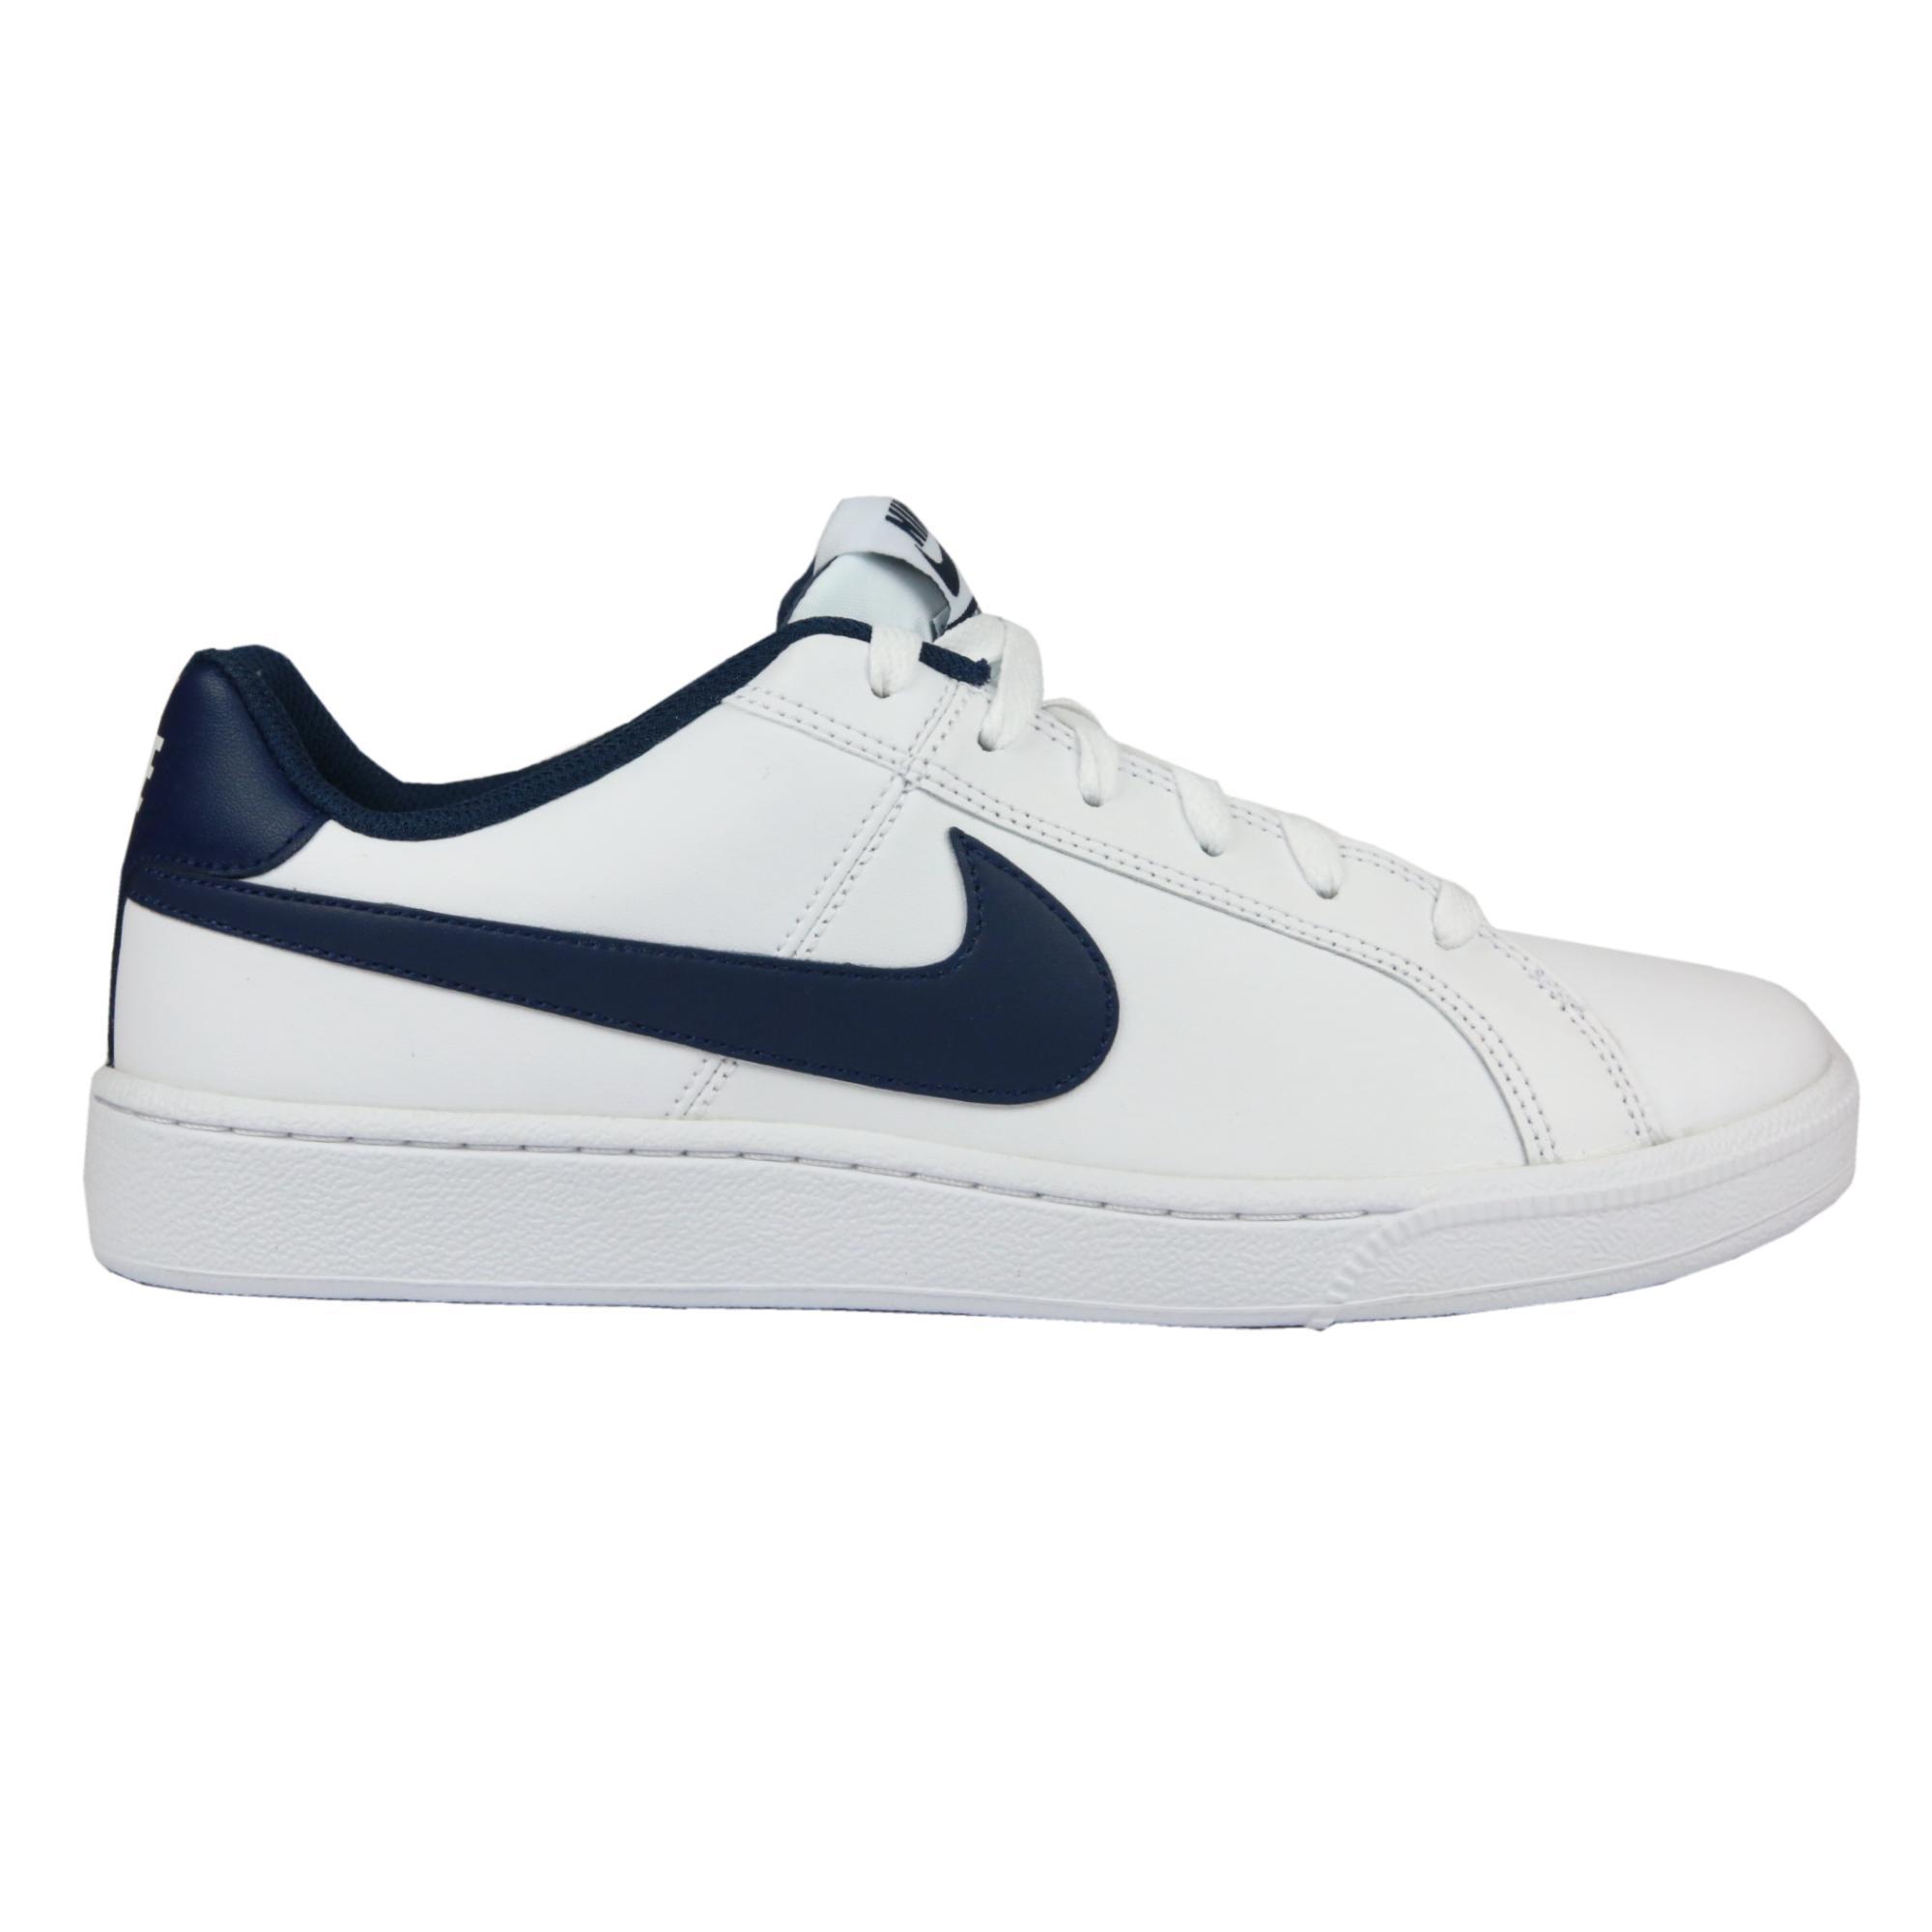 Nike Court Royal Herren Sneaker Schuhe Turnschuhe Dunkelblau